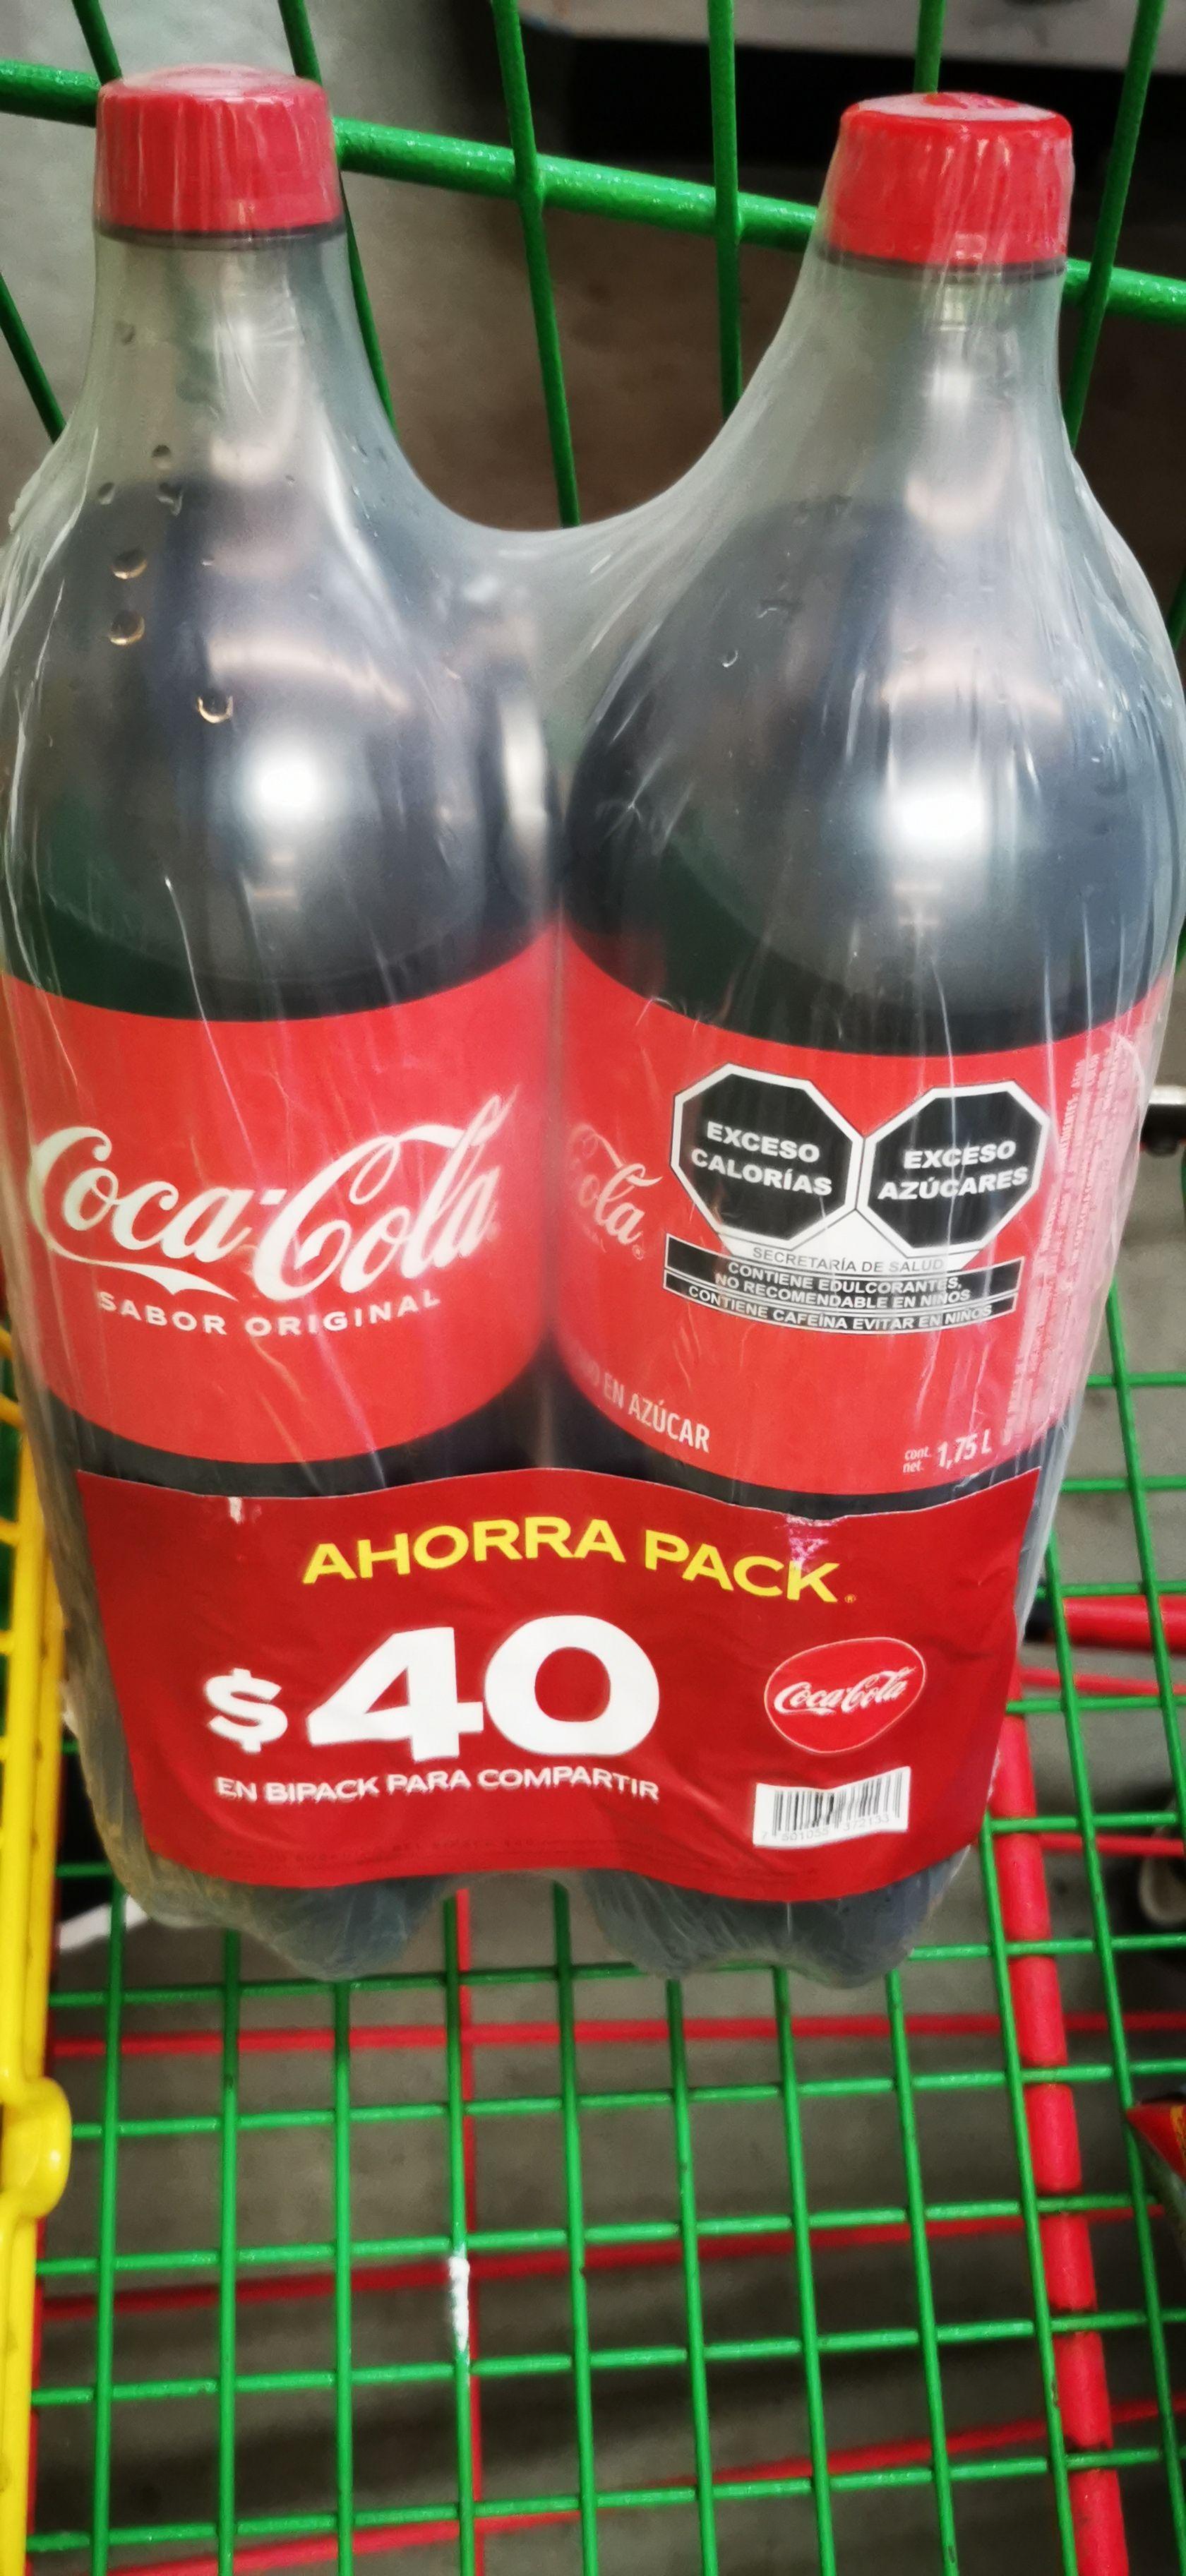 Bodega Aurrera : 2 refrescos Coca Cola 1.75